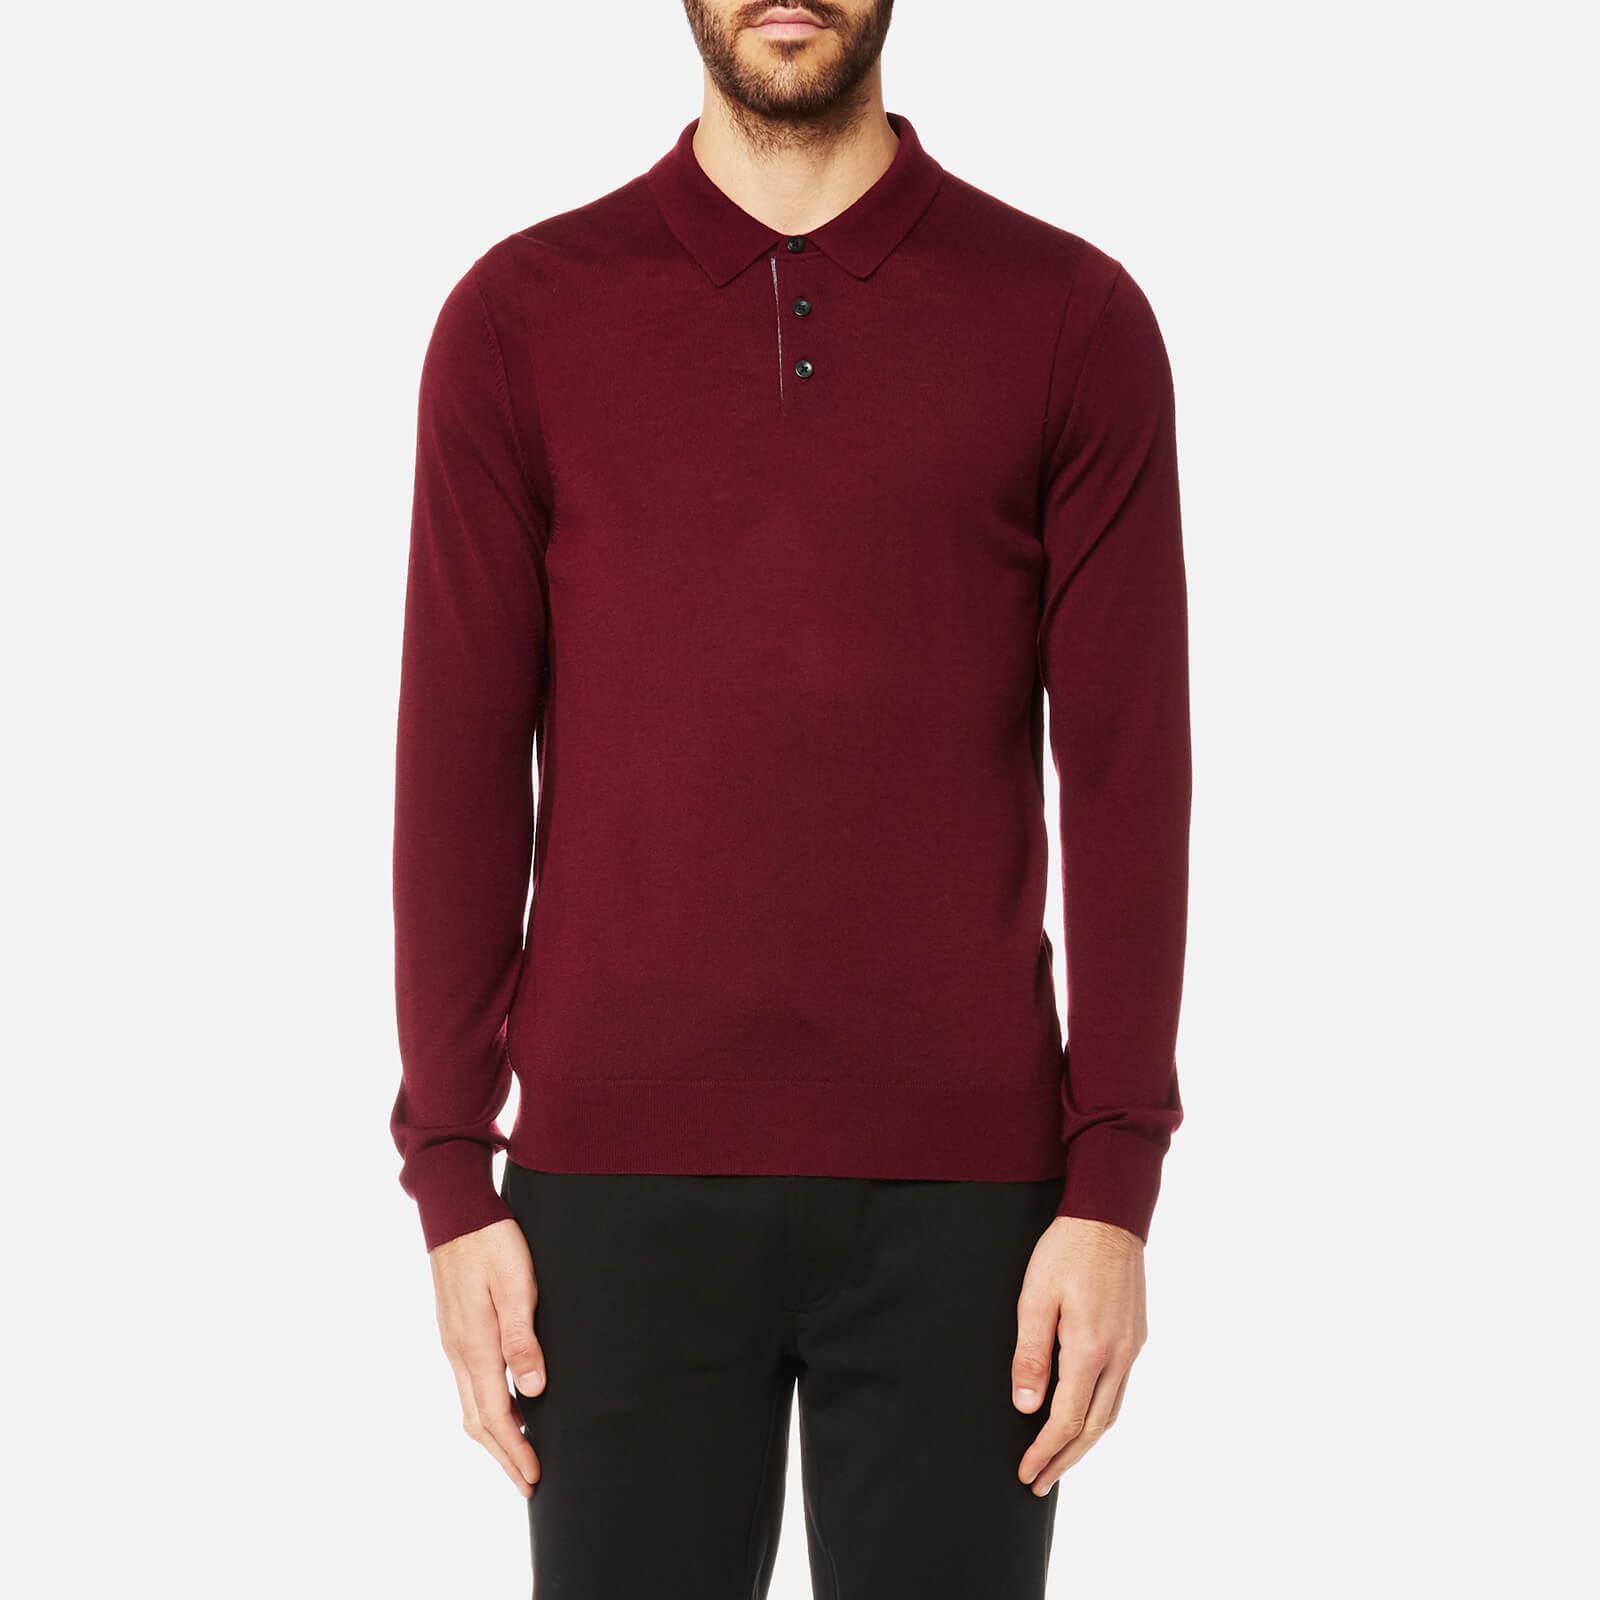 63adc854c Michael Kors Men's Merino Long Sleeve Polo Shirt - Chianti - Free UK  Delivery over £50